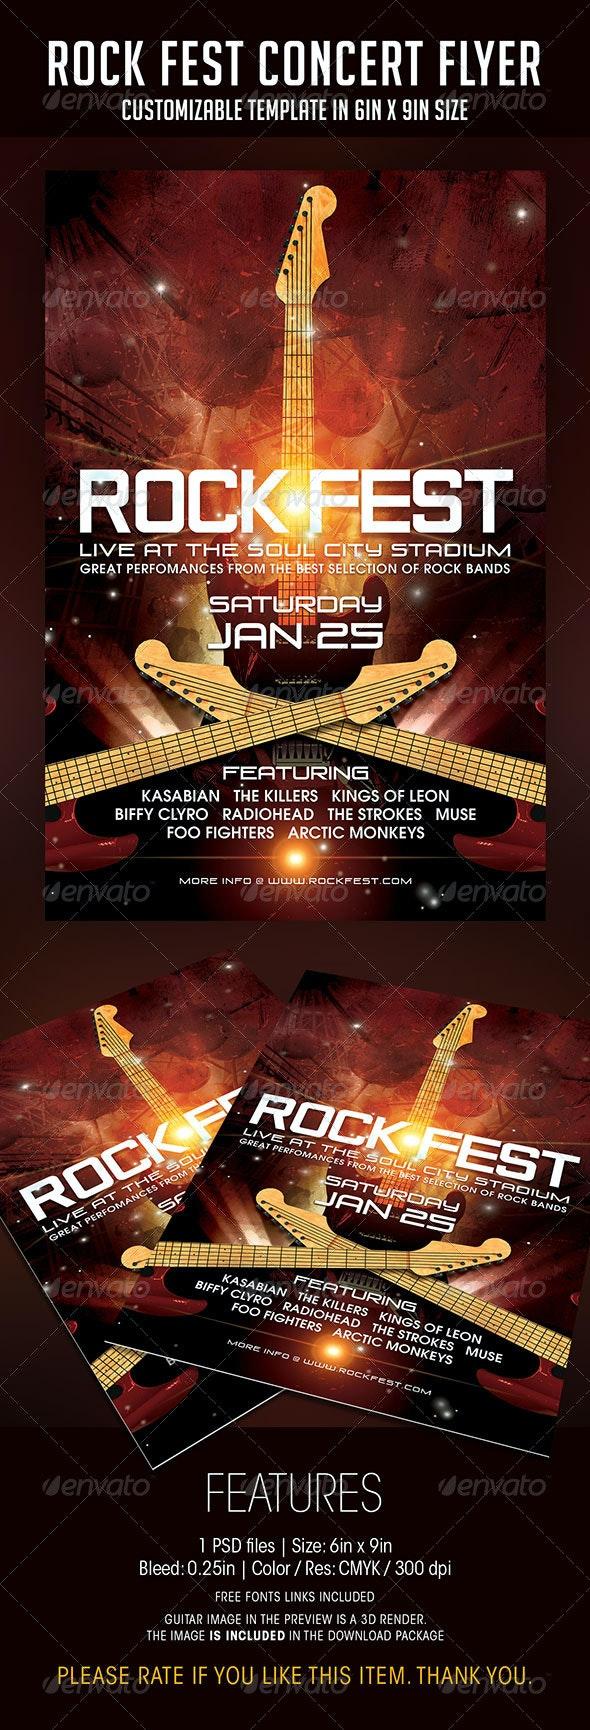 Rock Fest Concert Flyer - Concerts Events